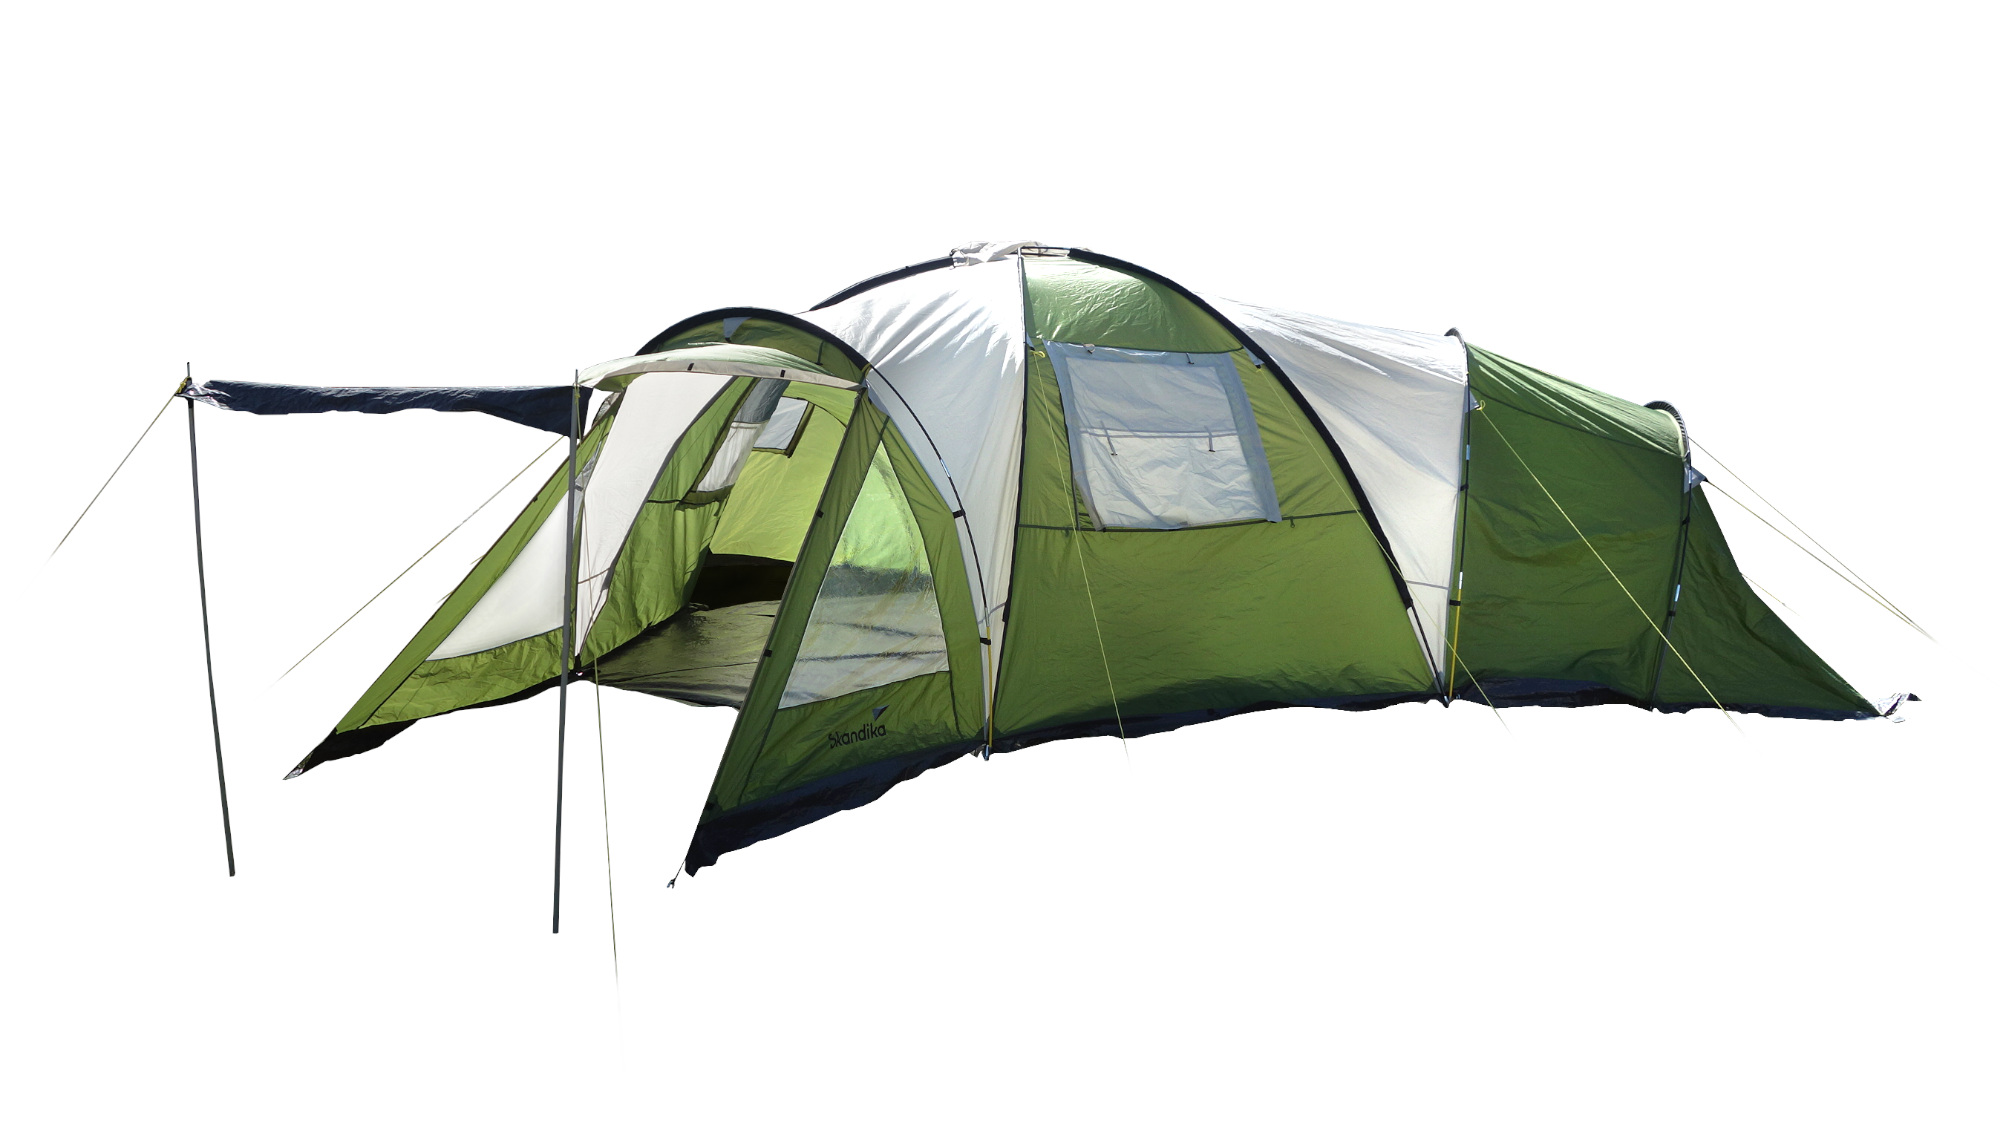 8-Personen Zelt leihen